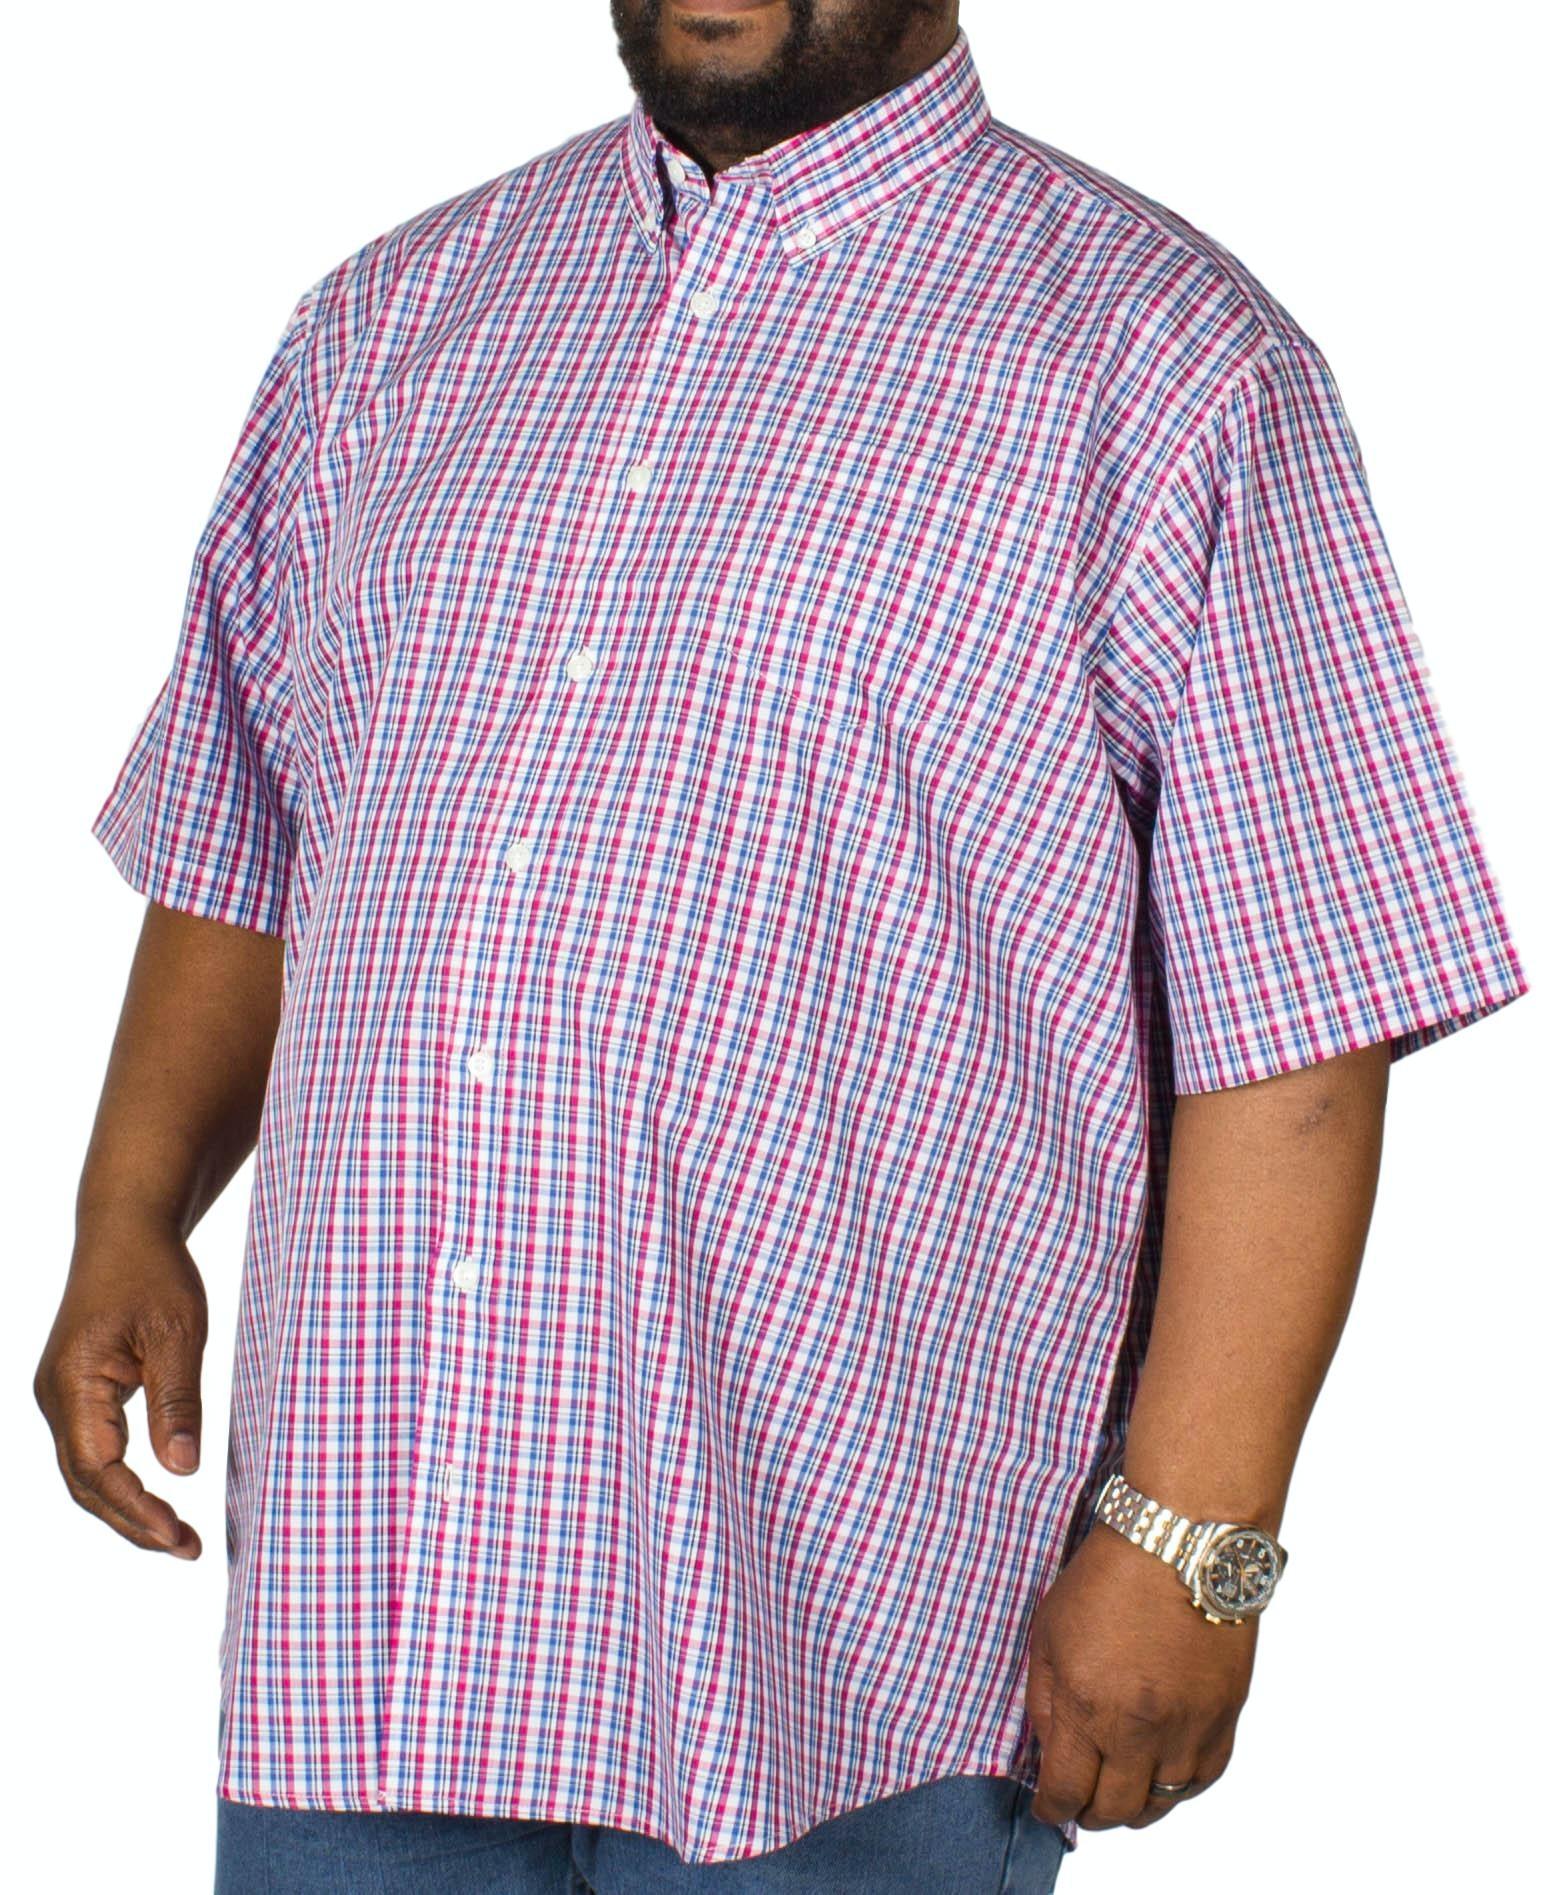 Carabou Check Short Sleeve Shirt Red